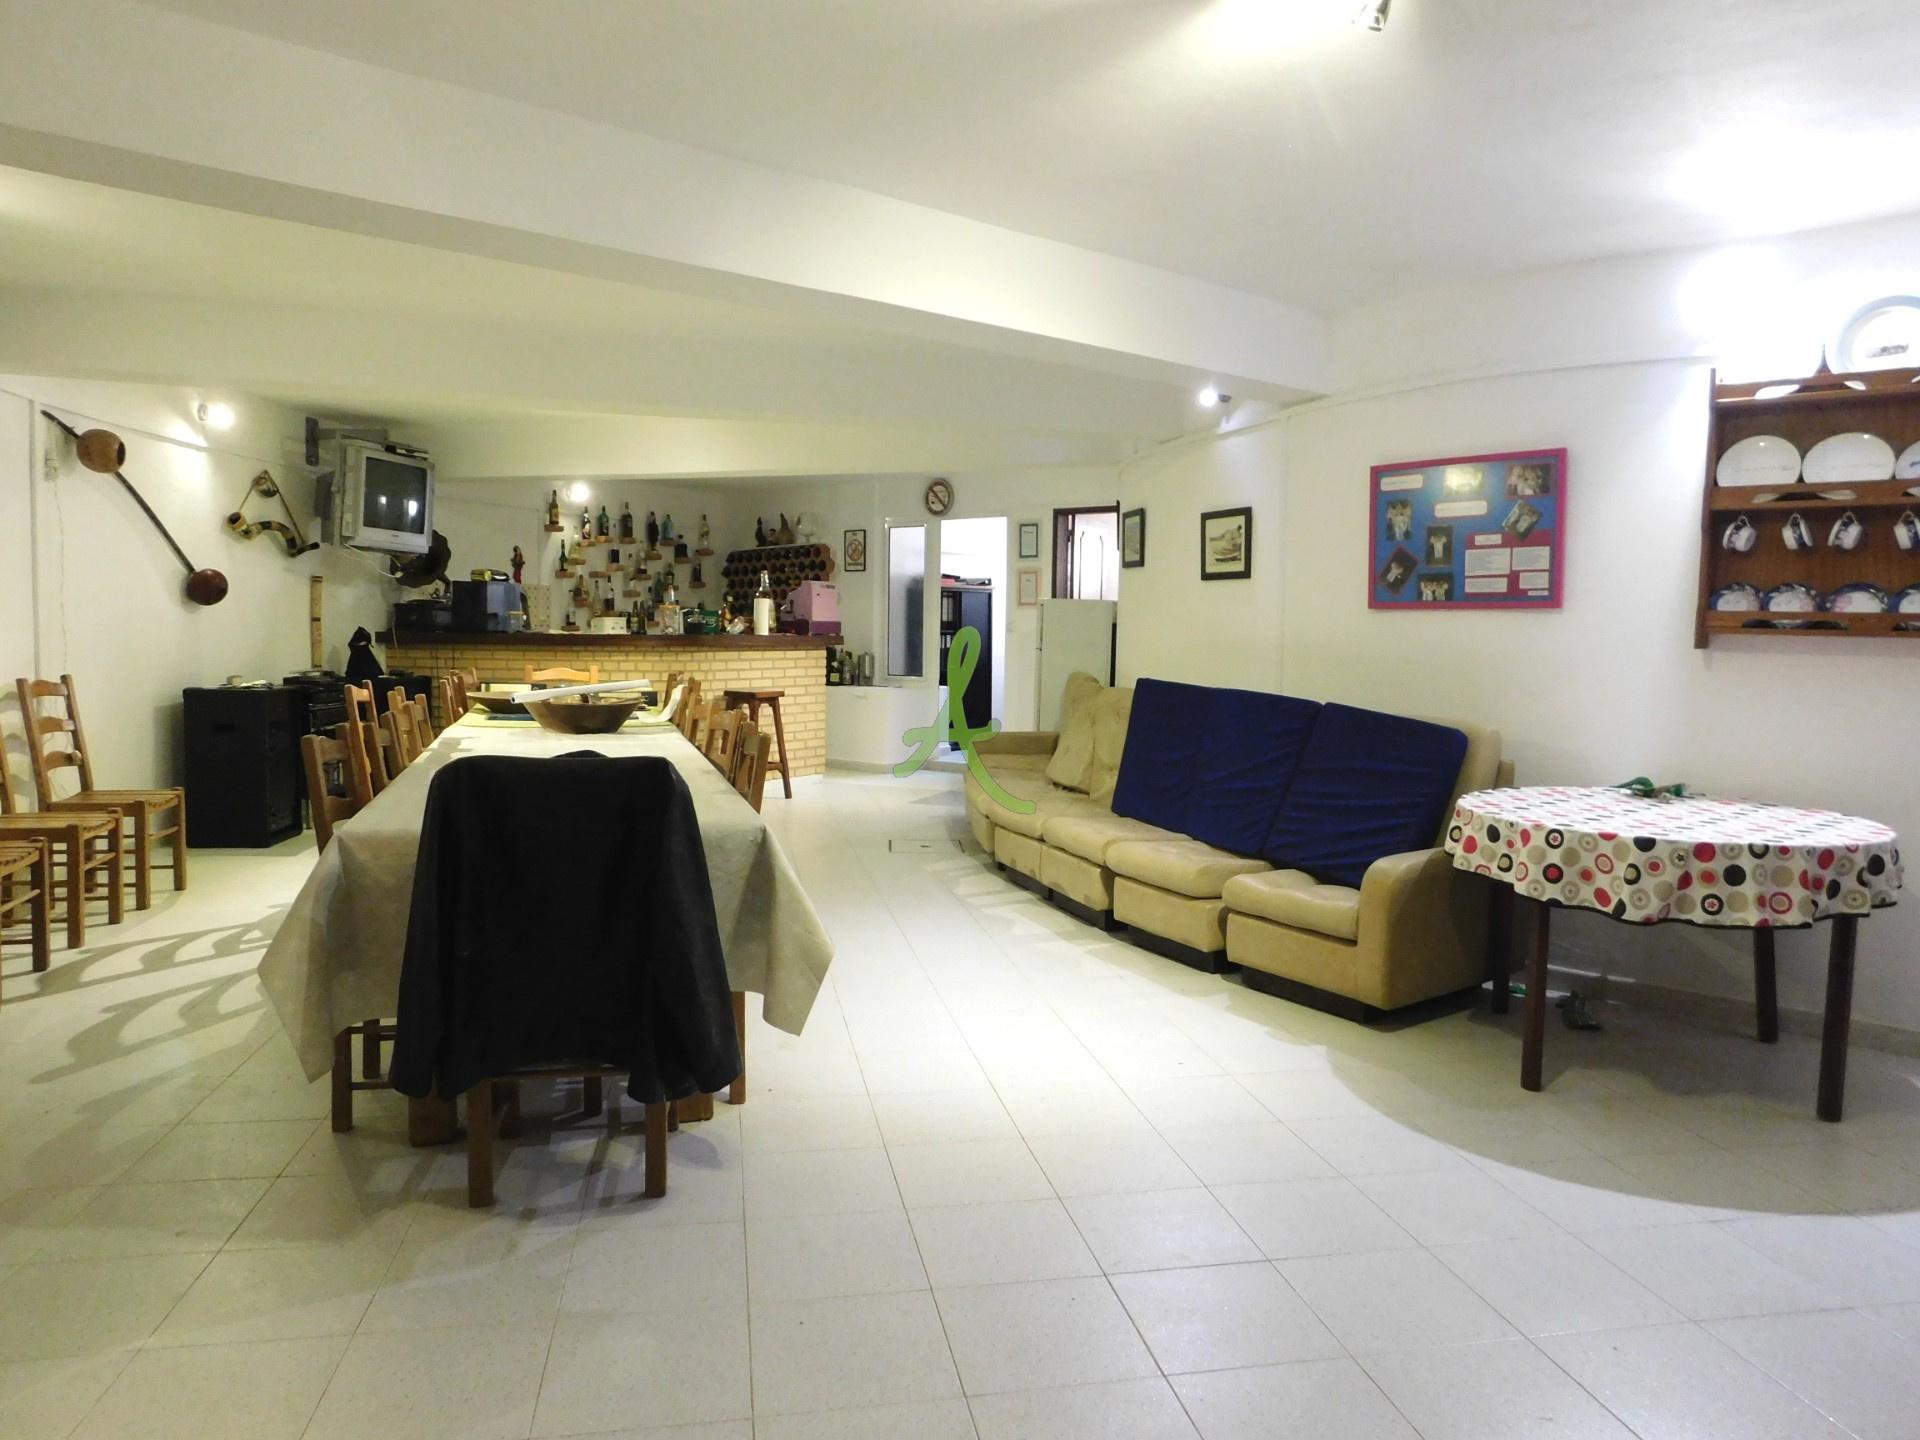 Sala de Convivio